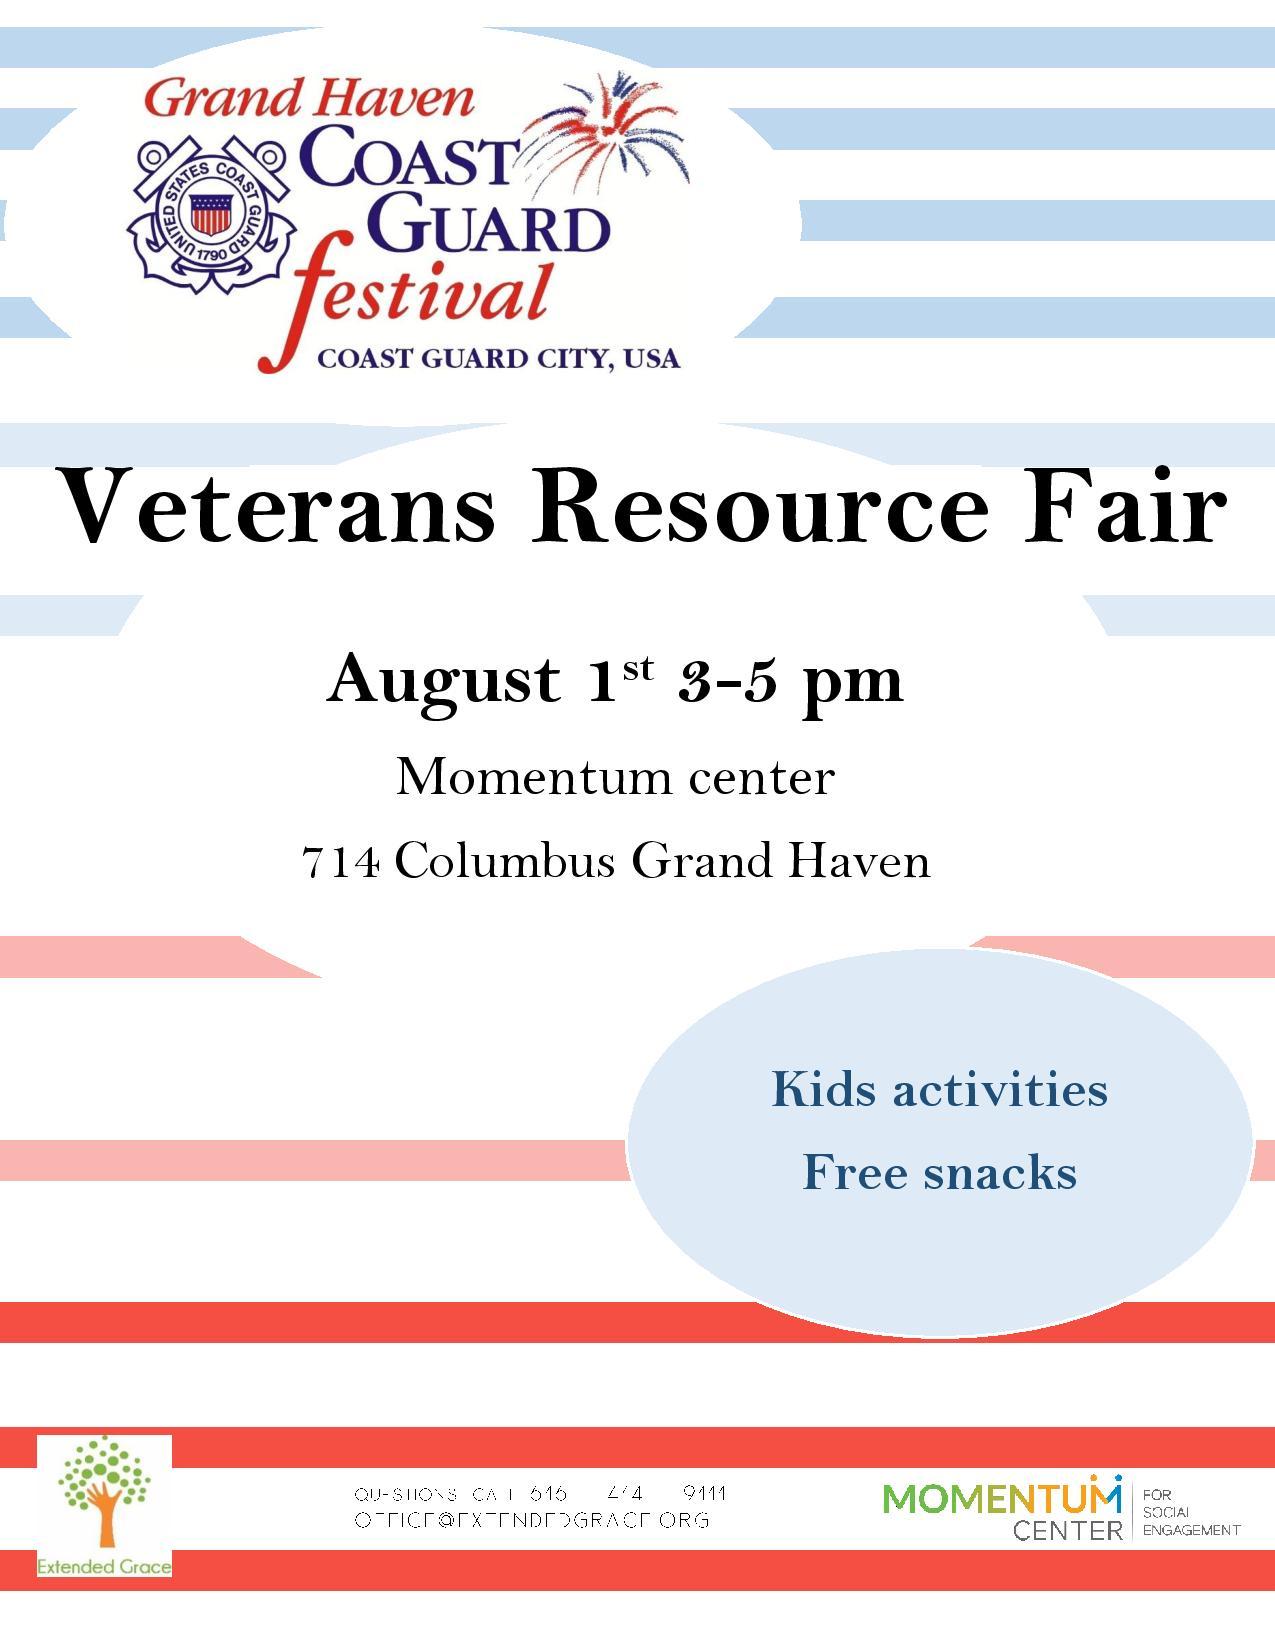 veterans resource fair flyer-page-001.jpg